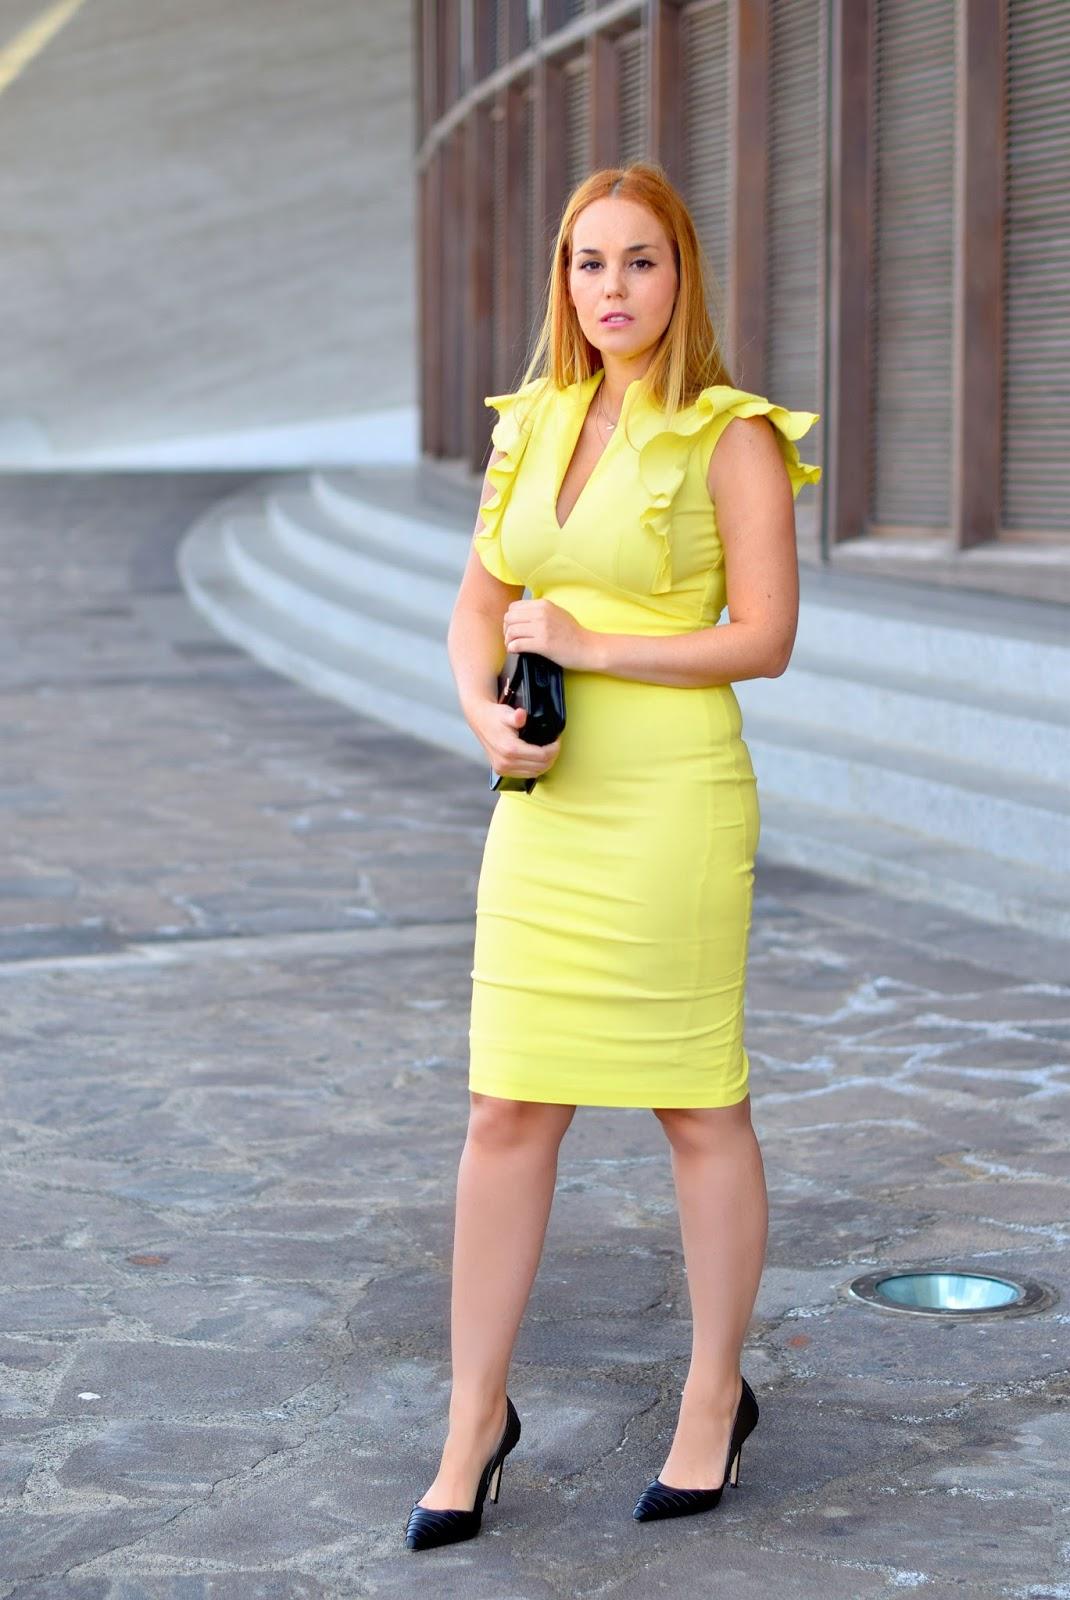 nery hdez, perfect guest, hybrid, zara shoes, lime dress, invitada perfecta